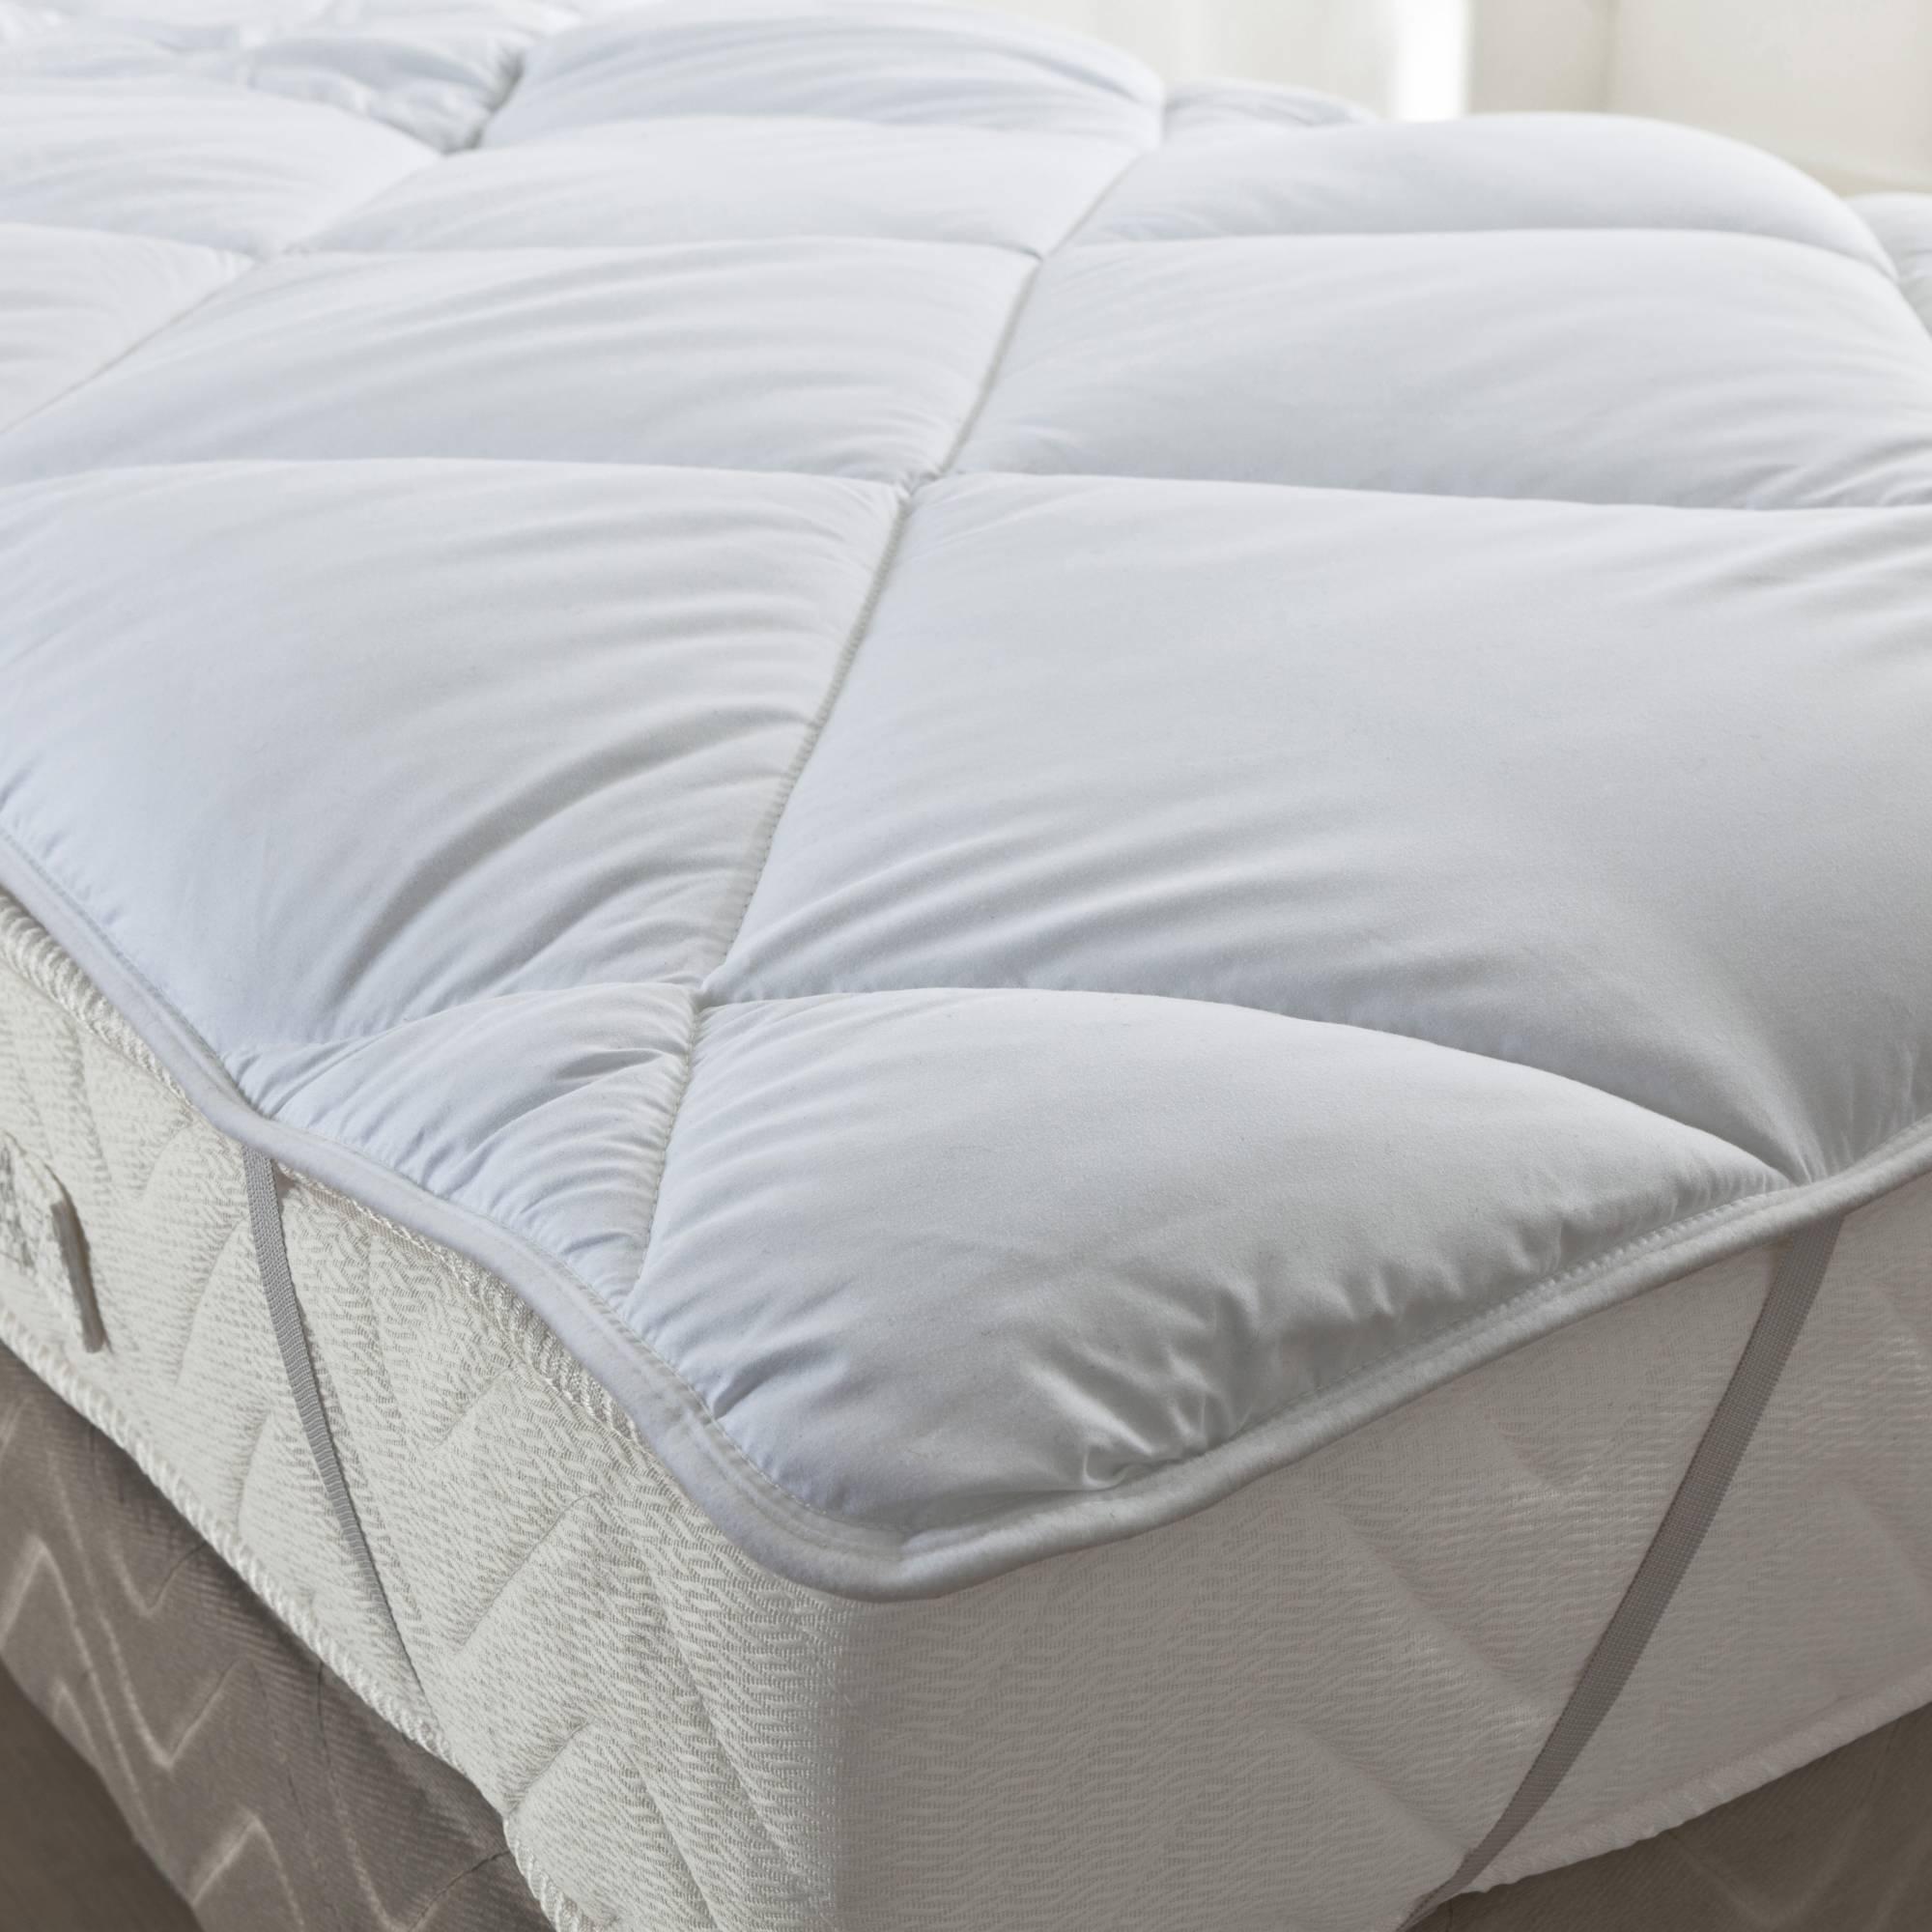 bleu c lin surmatelas bouillir 160 x 200 cm comparer. Black Bedroom Furniture Sets. Home Design Ideas